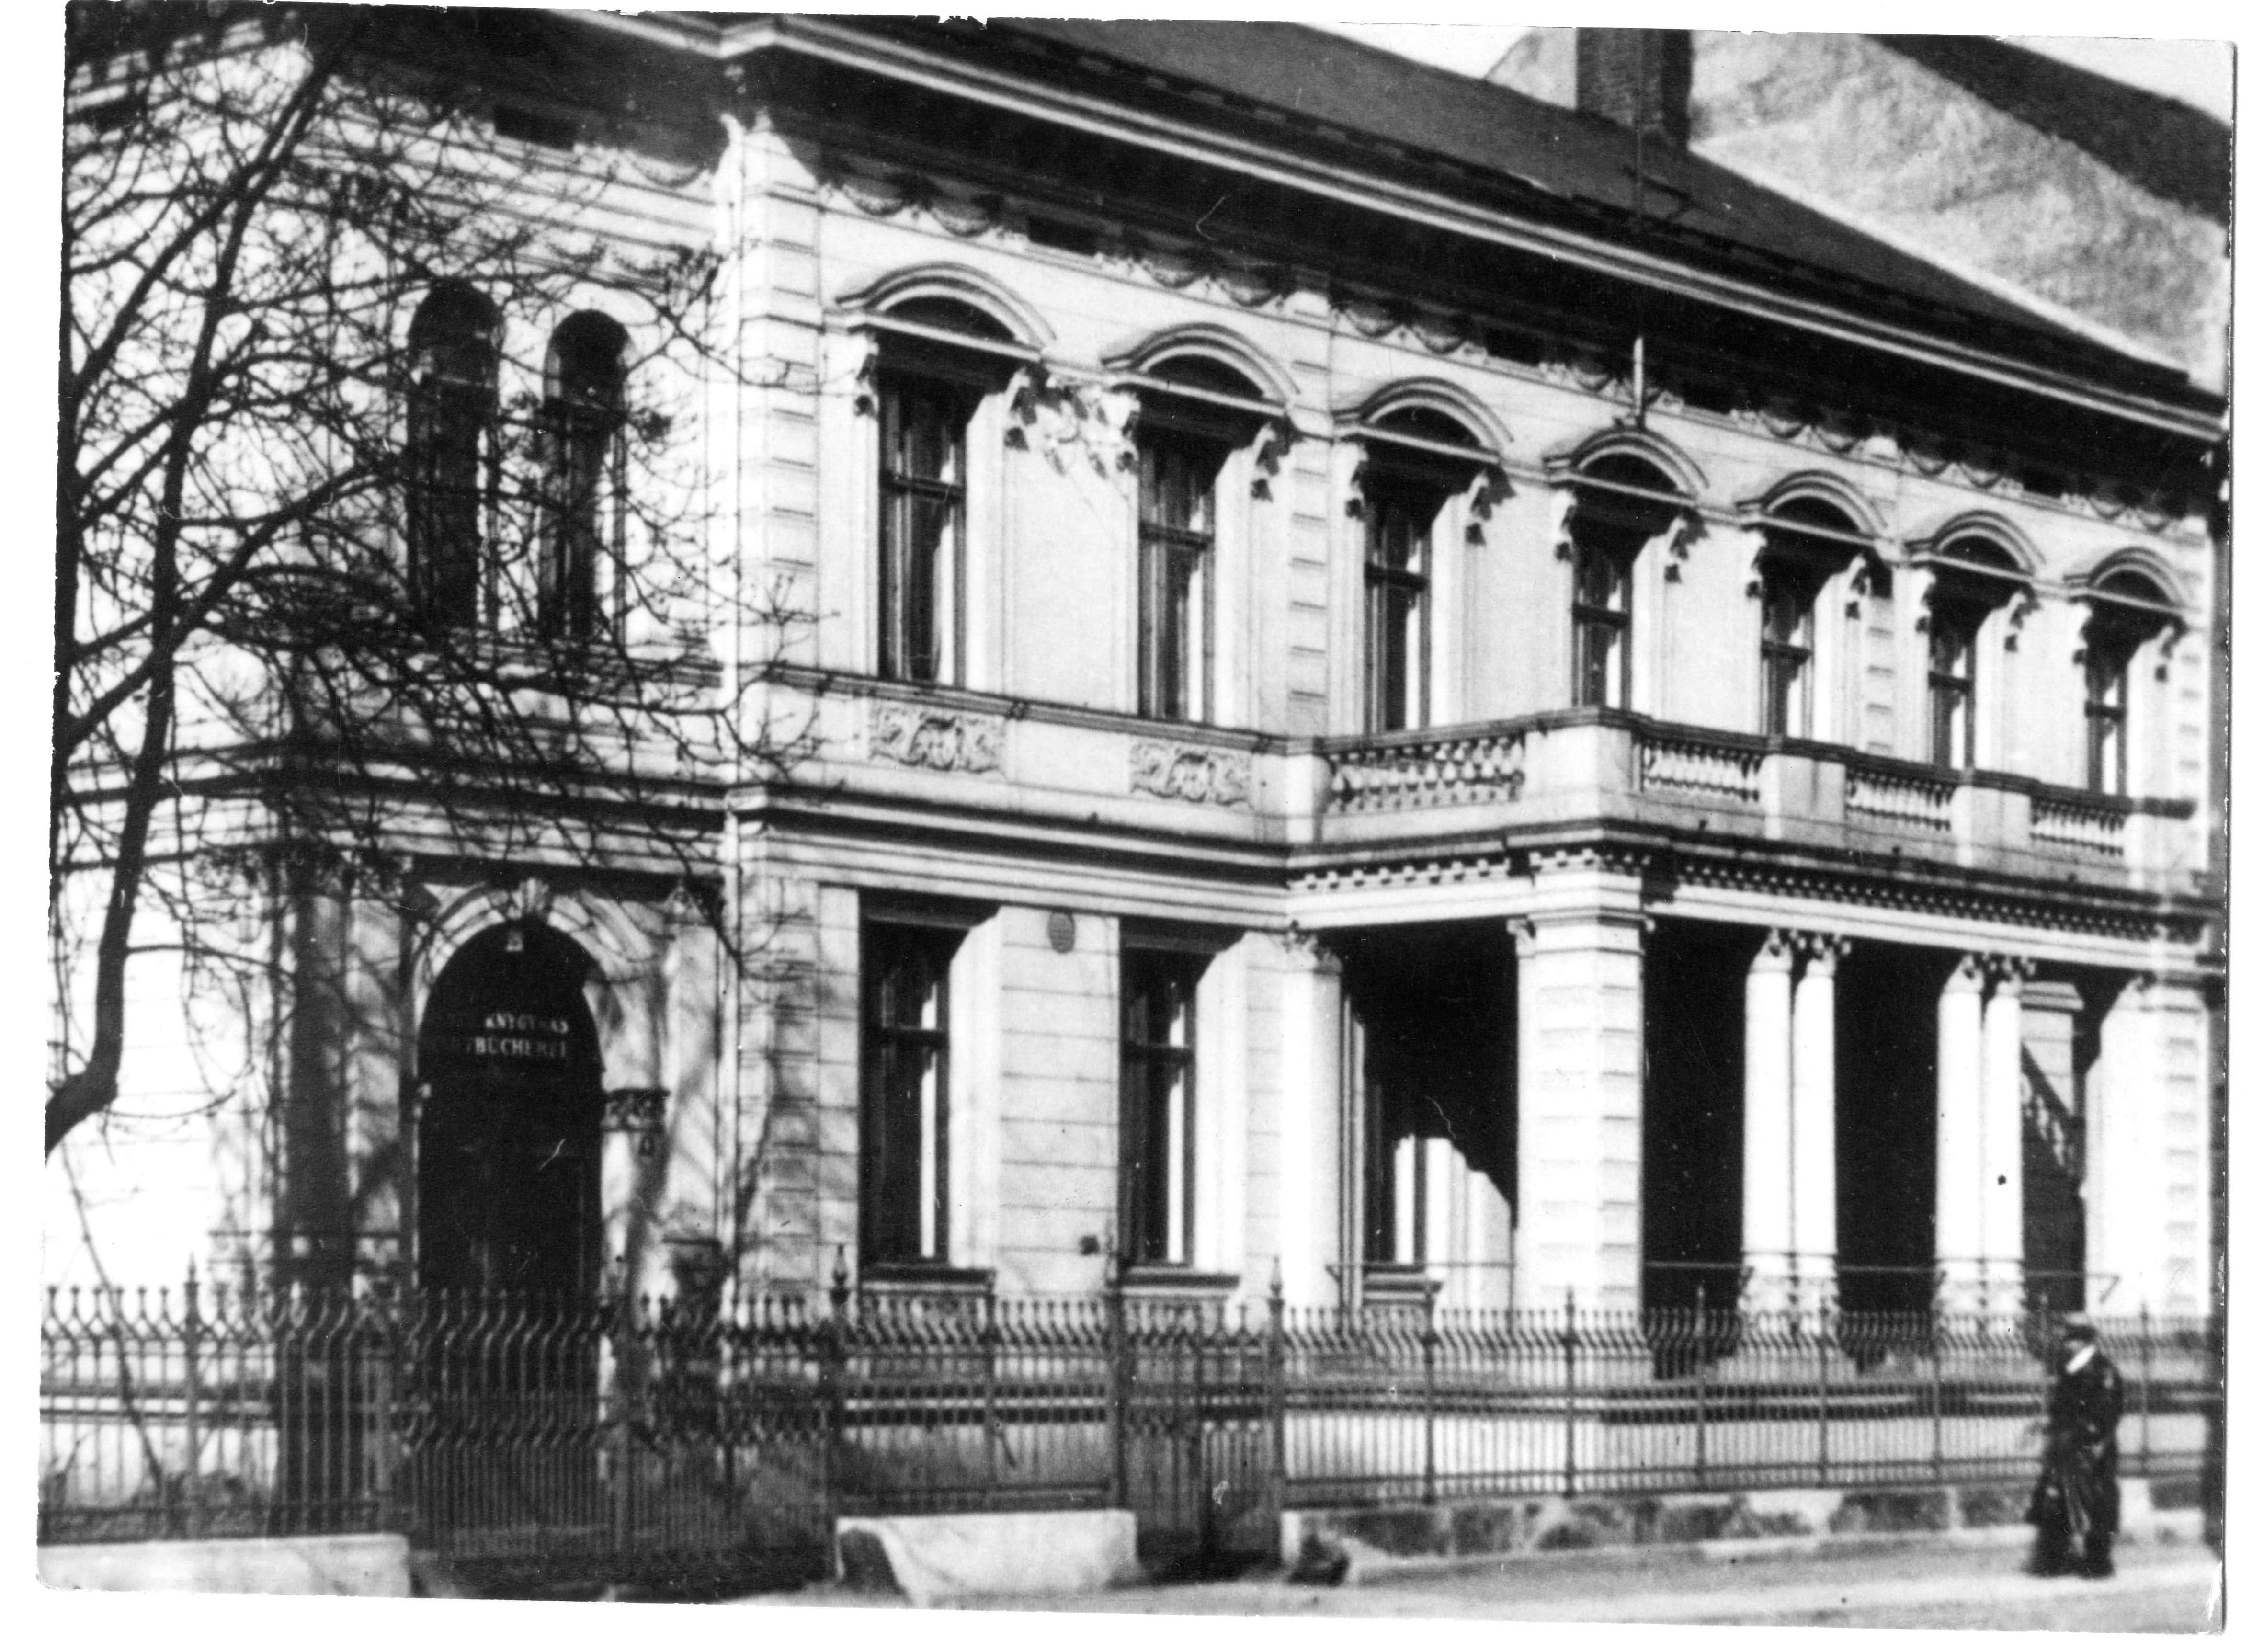 Klaipėdos miesto biblioteka 1936 | Klaipėdos bibliotekos nuotr.